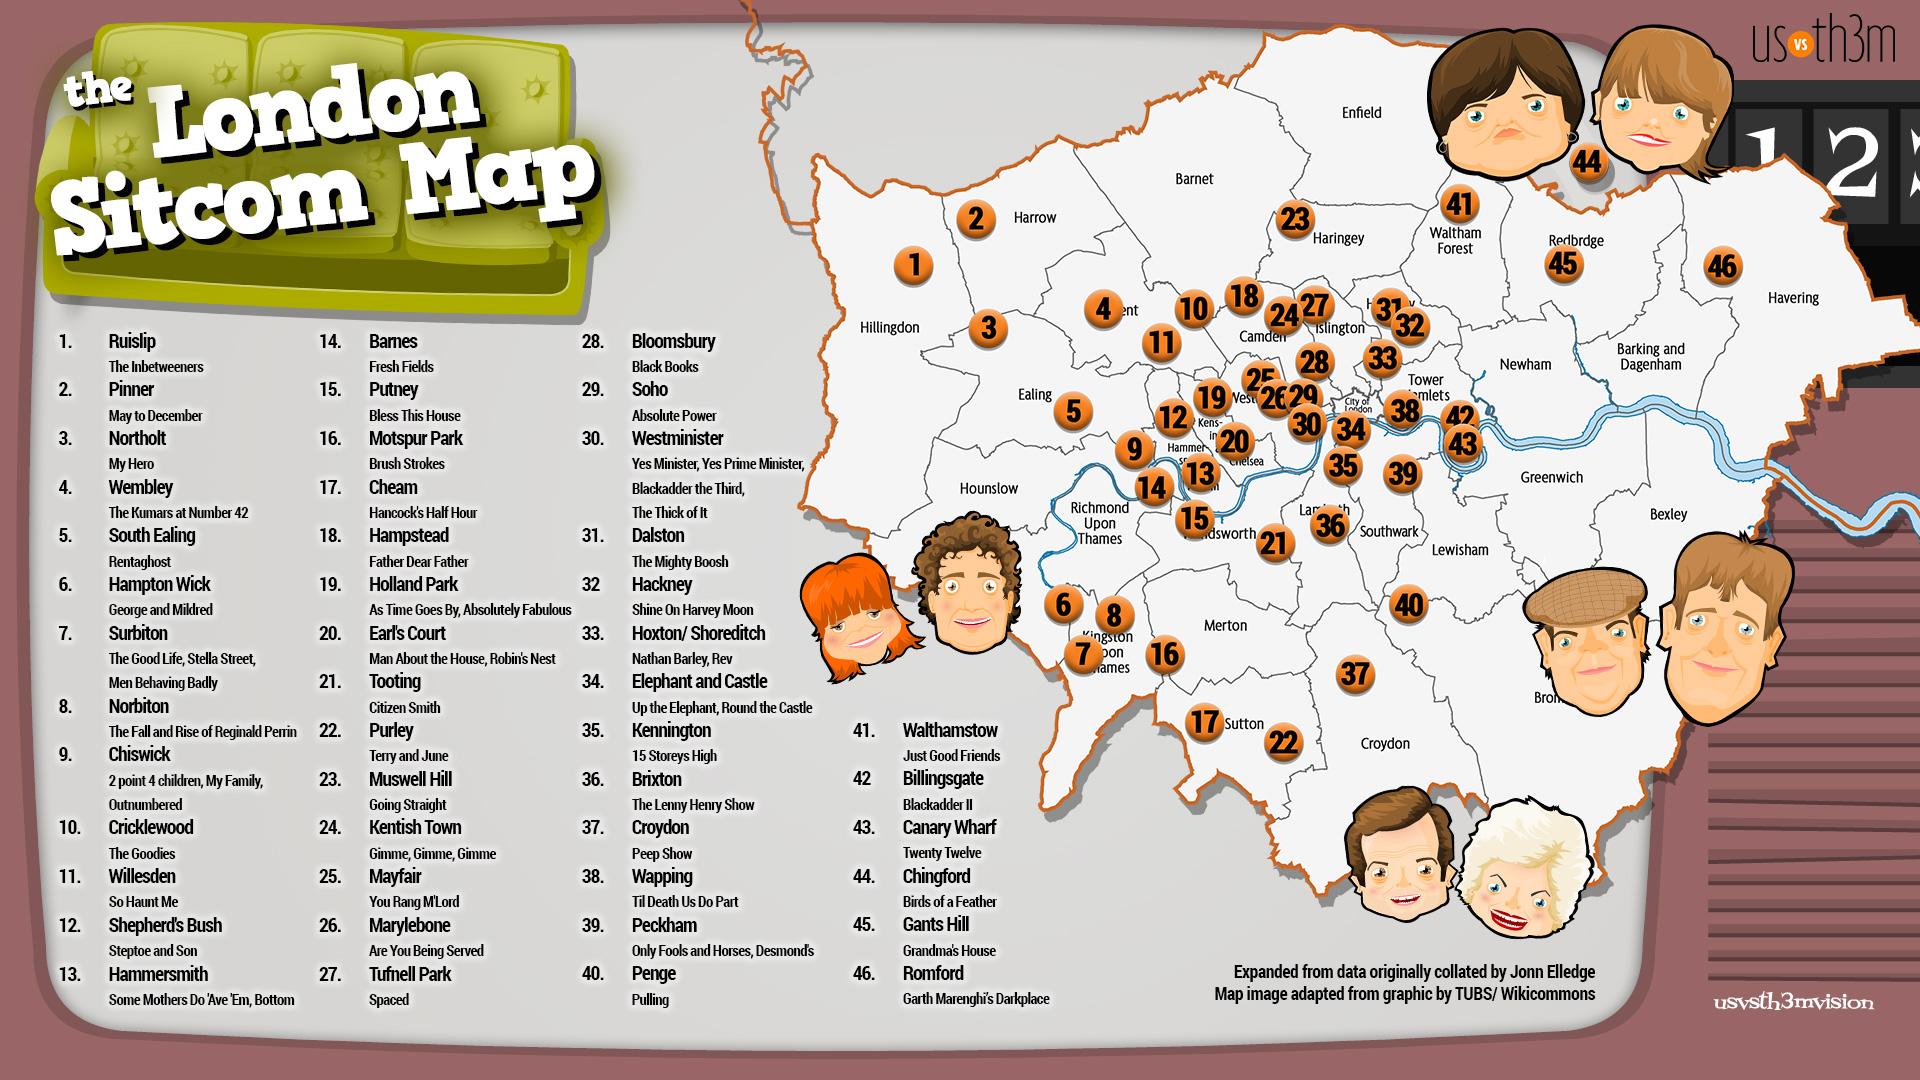 The London Sitcom Map